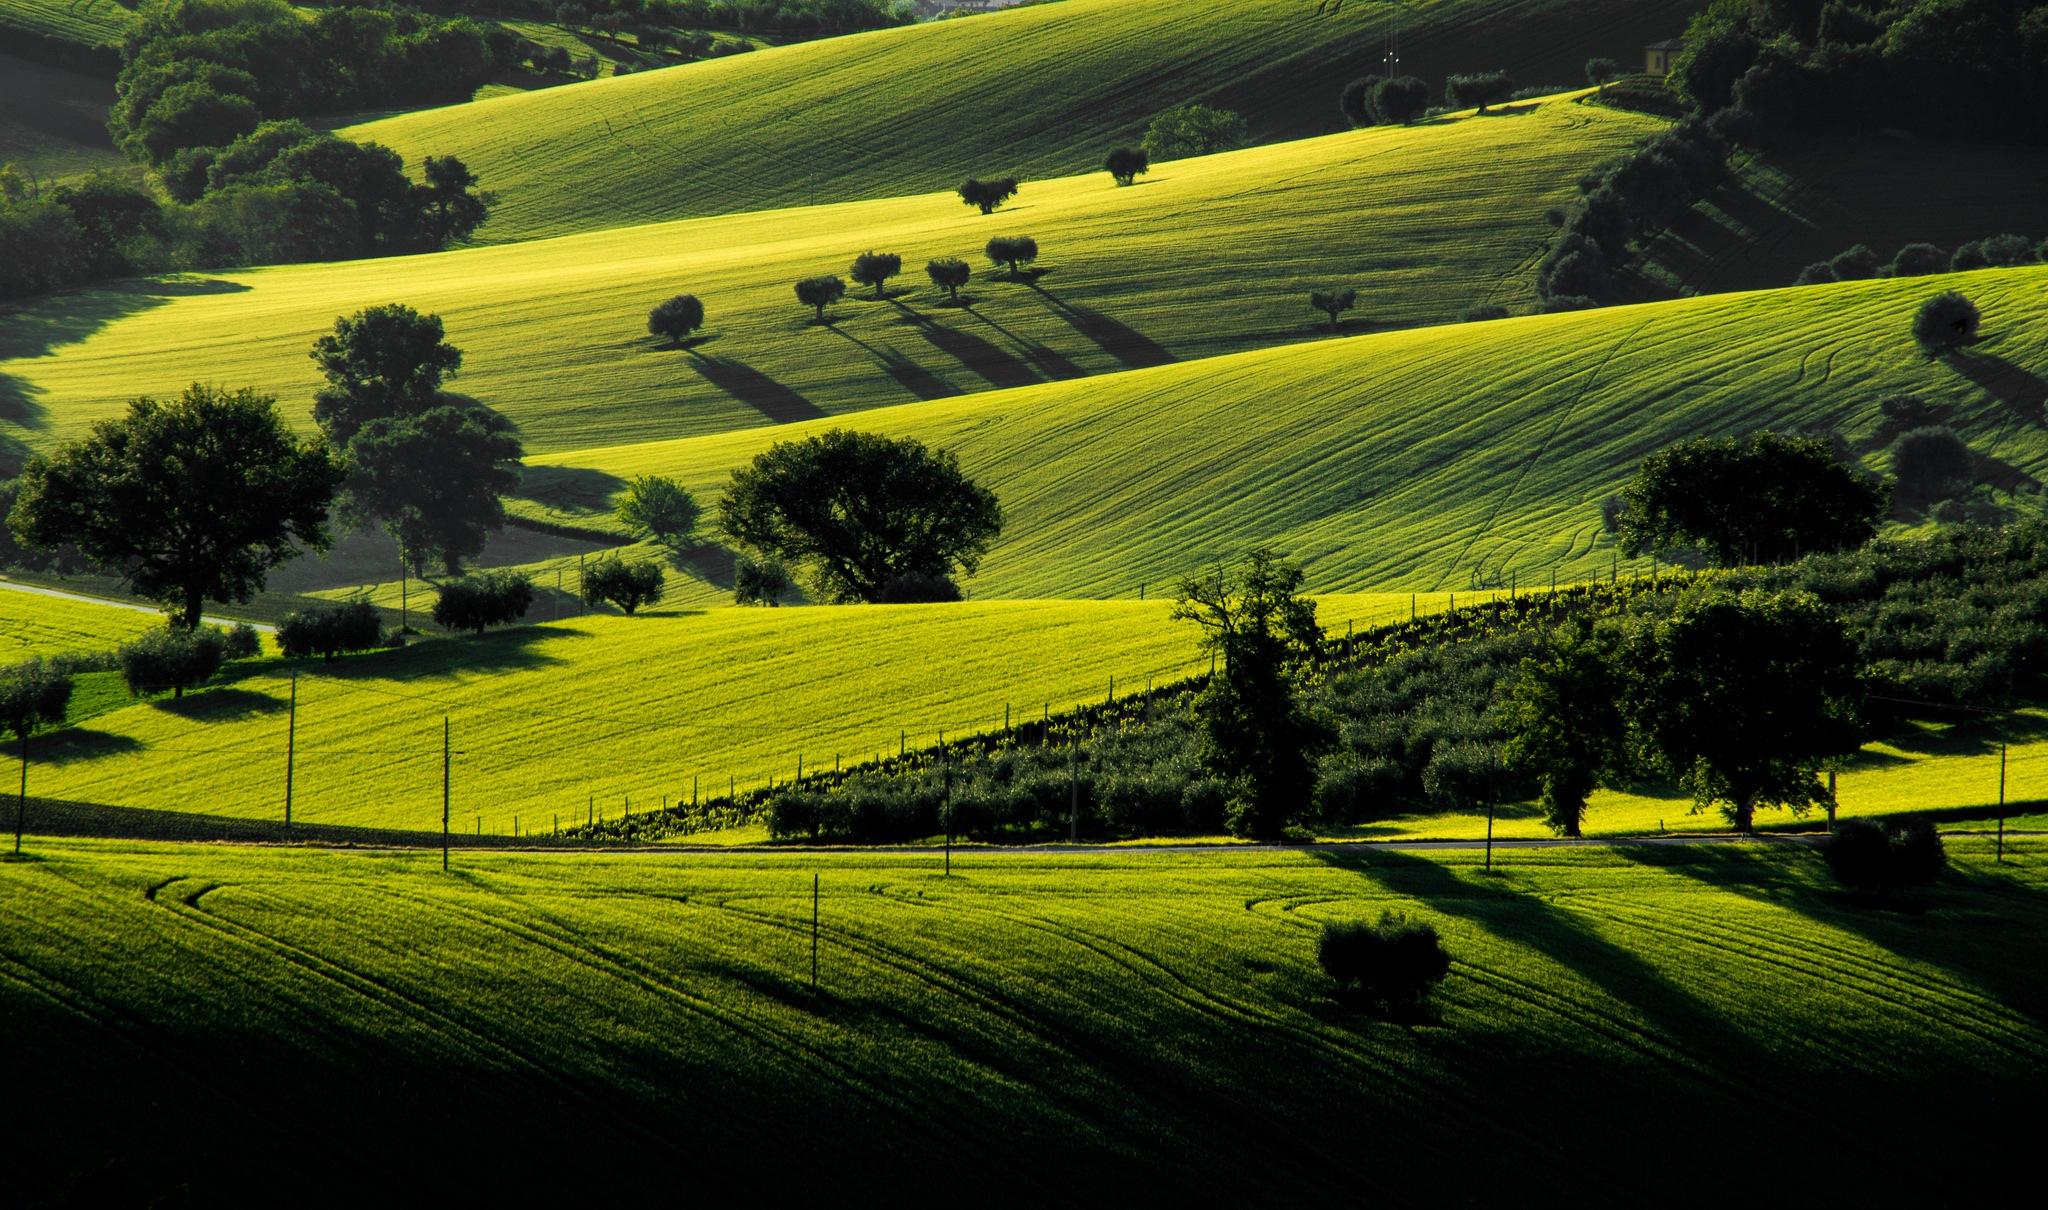 Italian Green hills by EmanueleZ